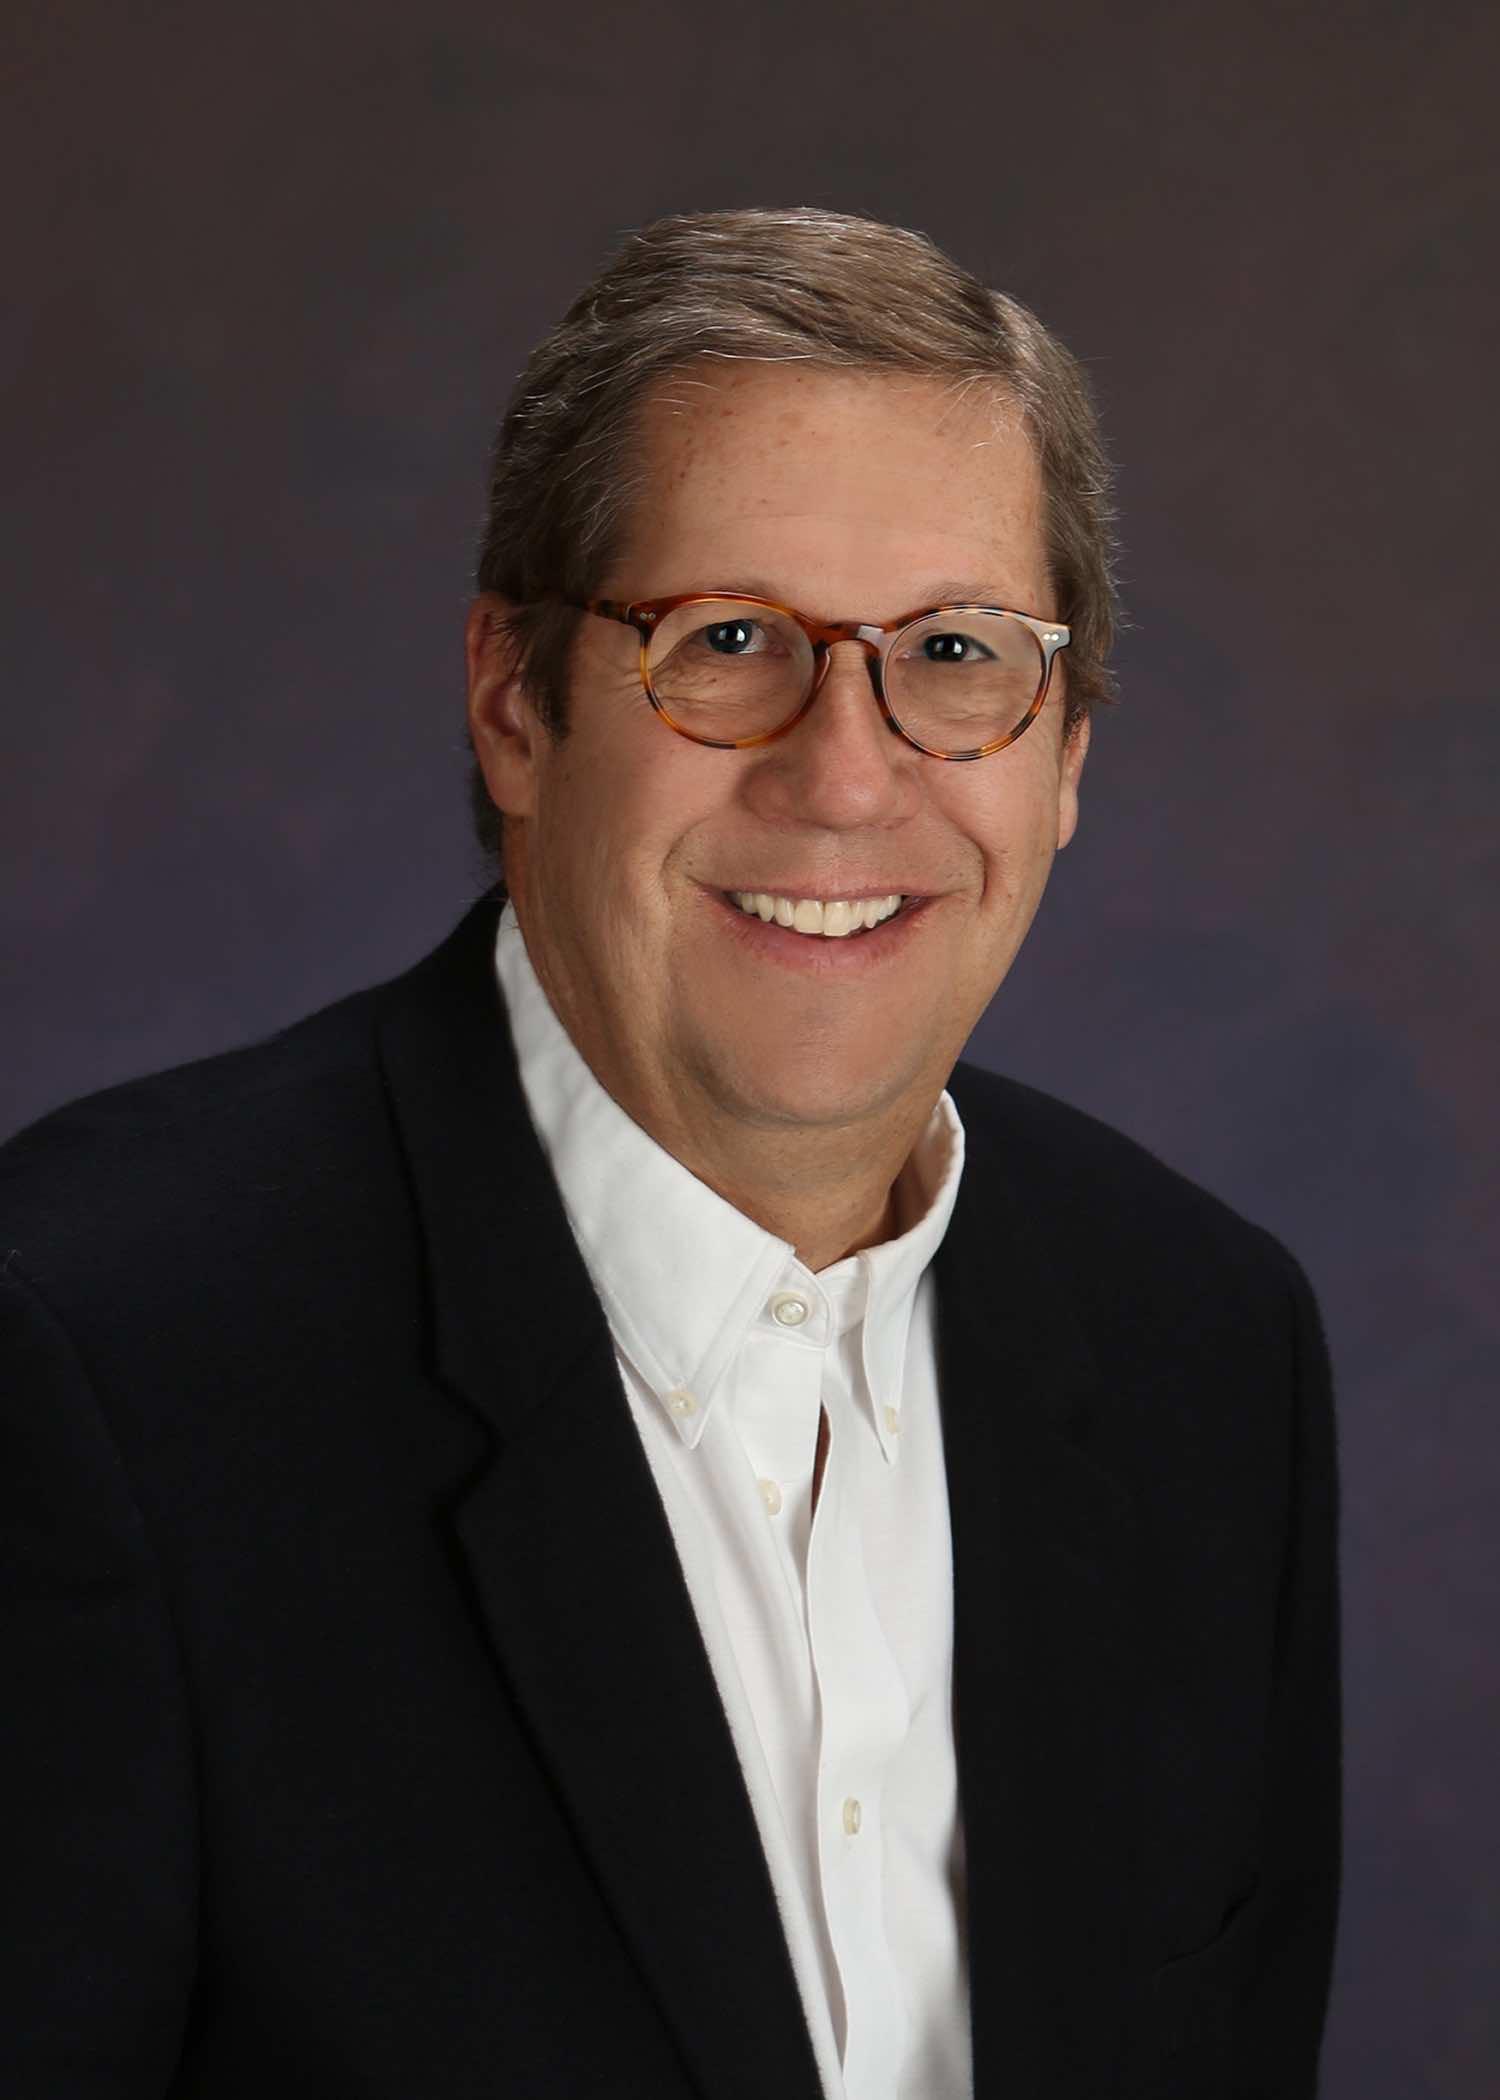 Daniel Mahoney